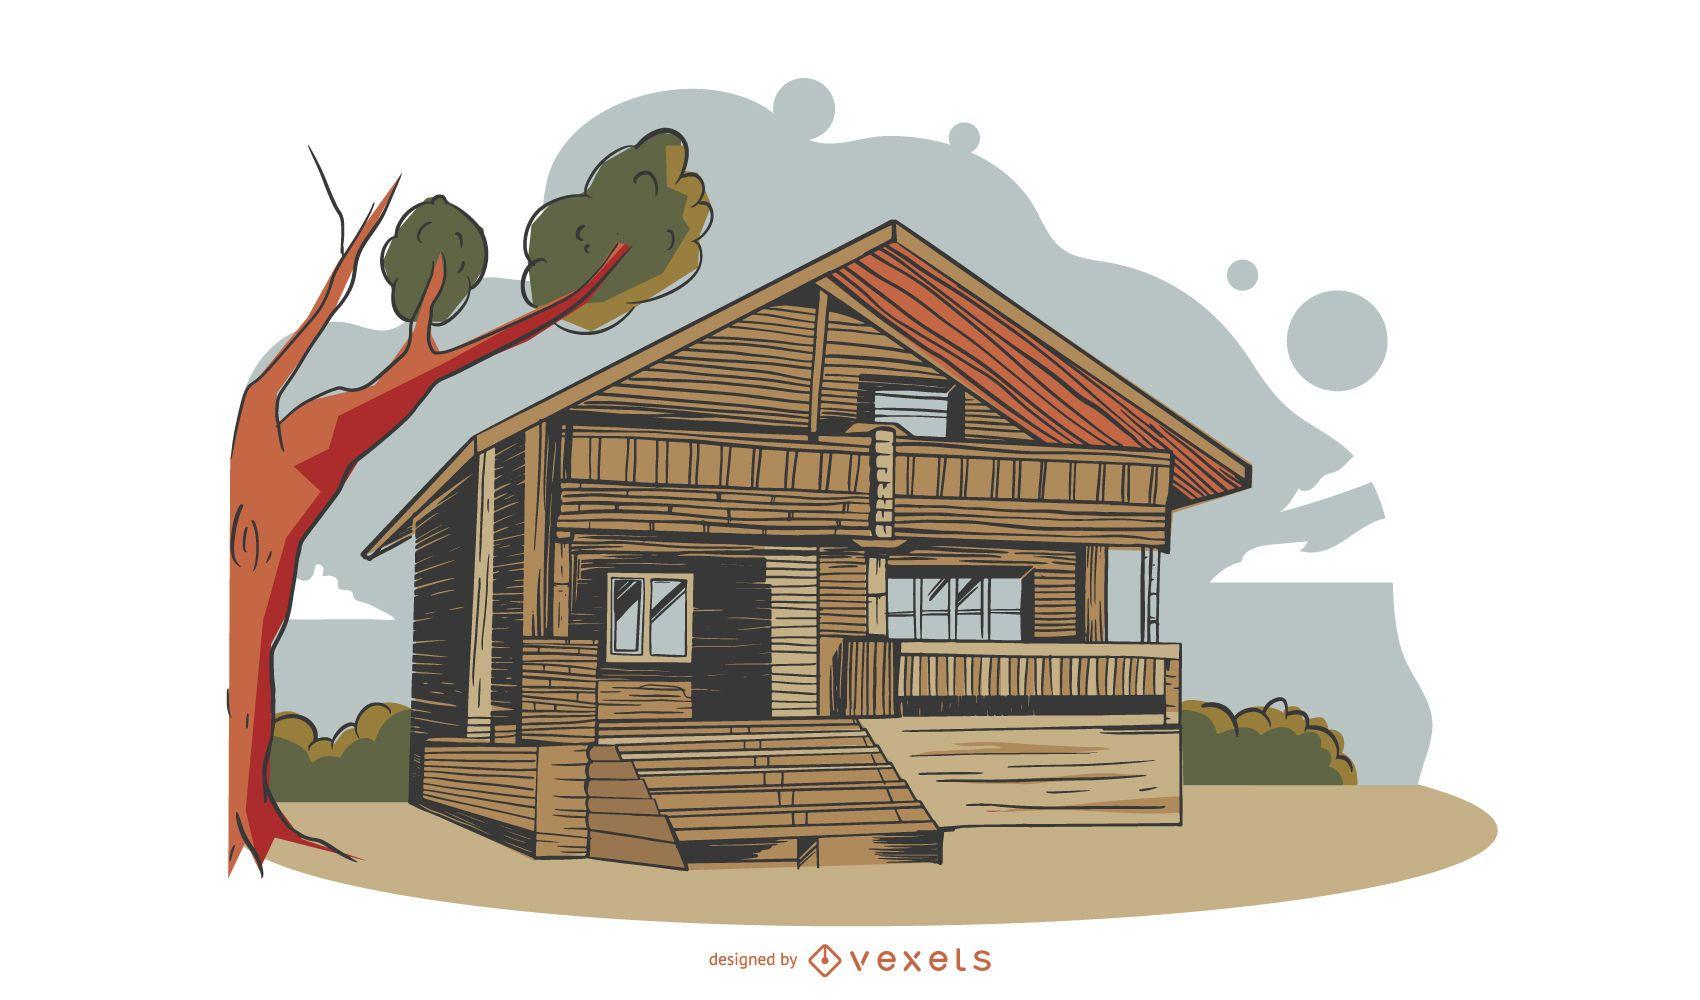 Colored Eco-home Building Design